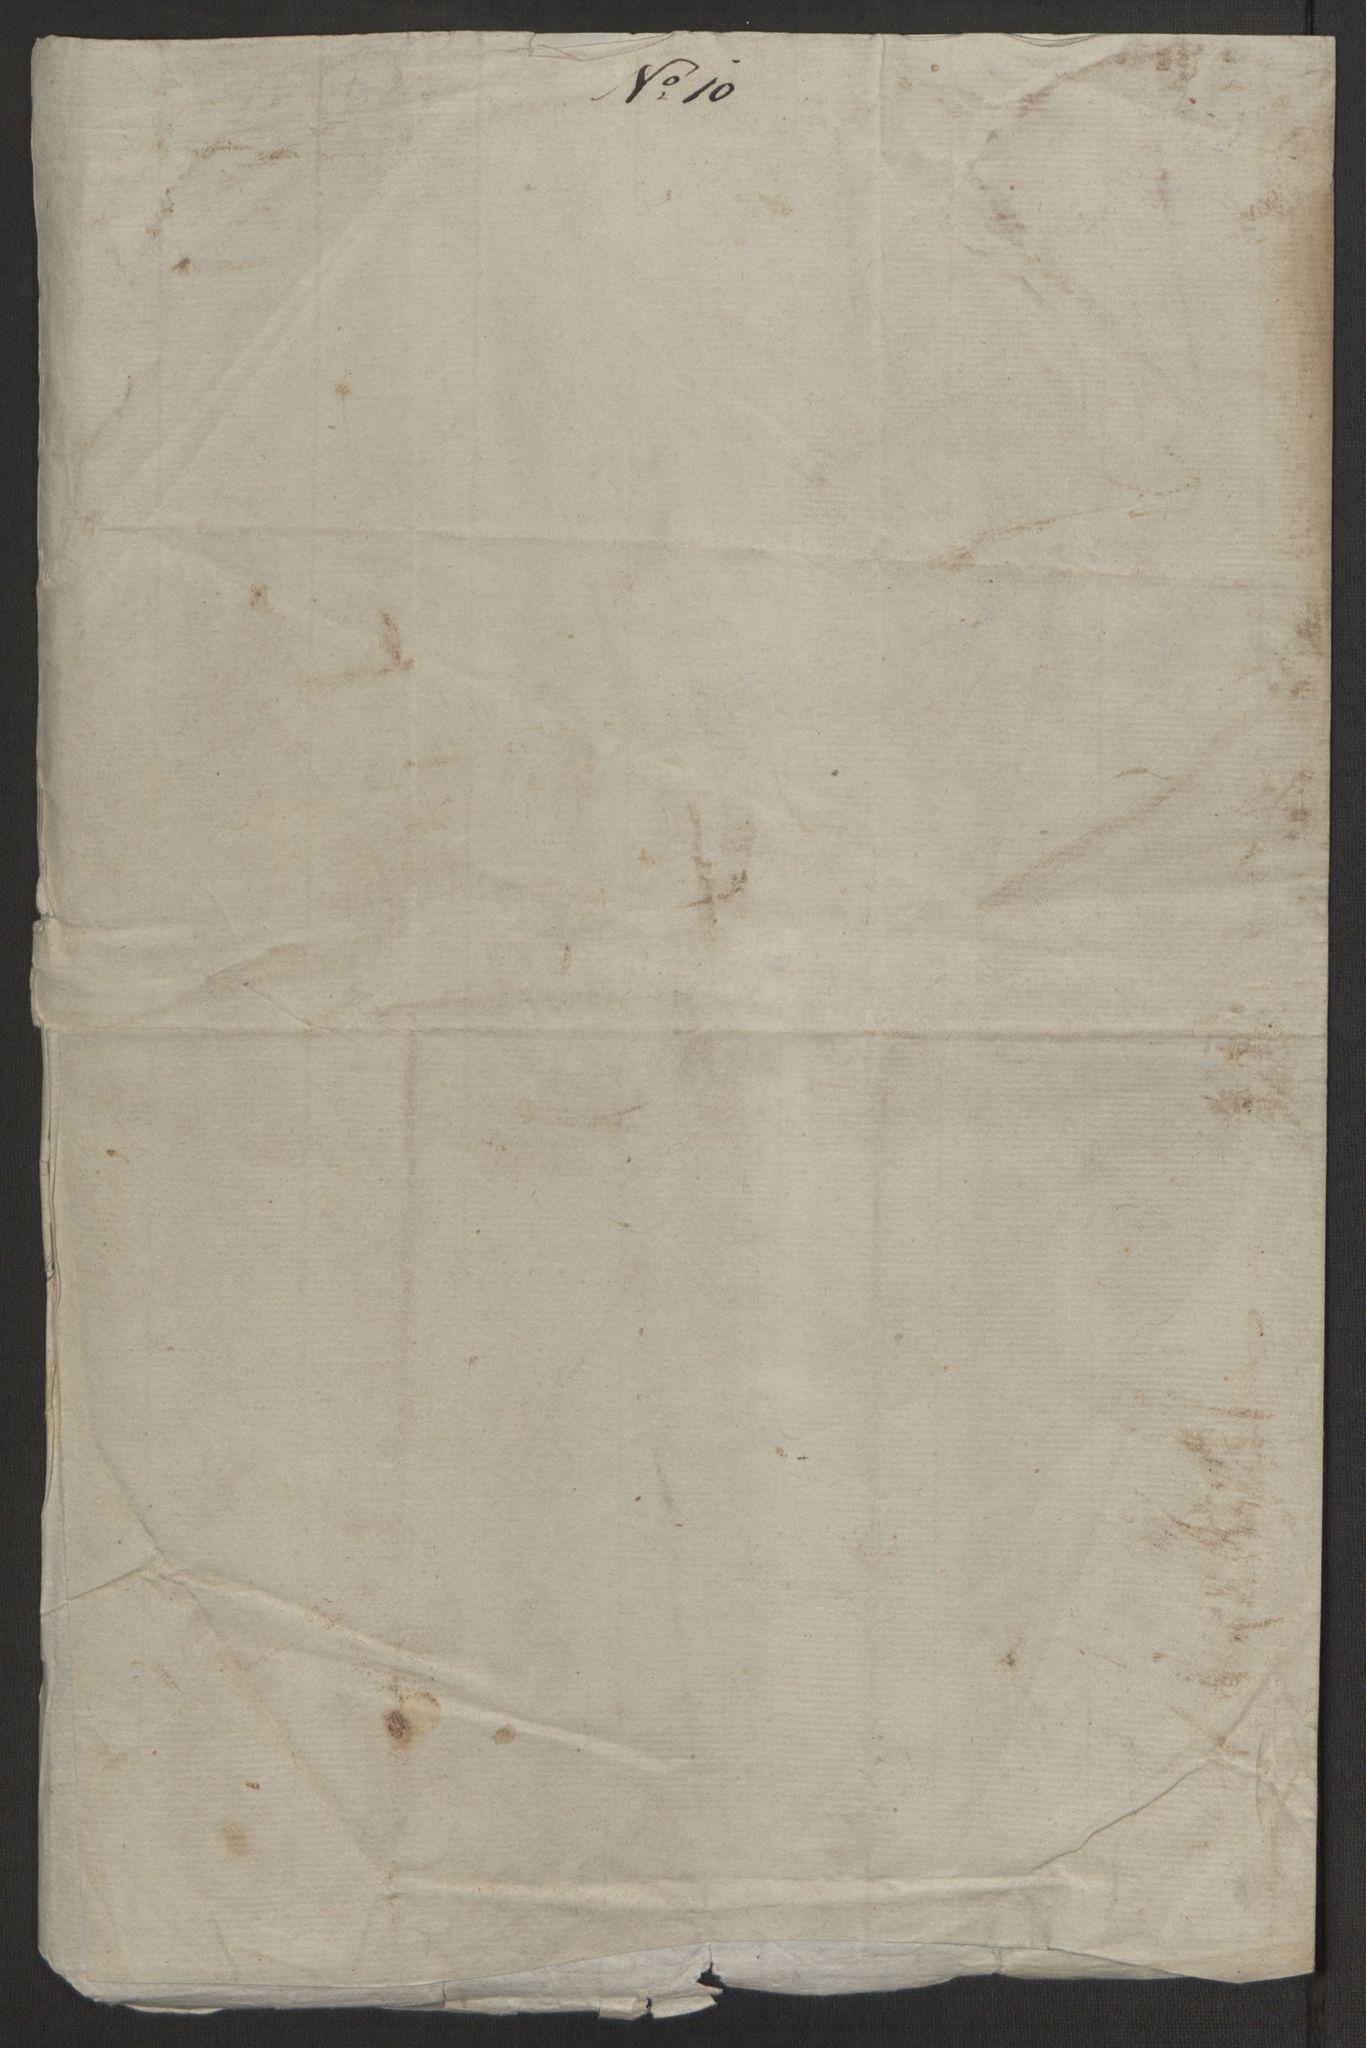 RA, Rentekammeret inntil 1814, Realistisk ordnet avdeling, Ol/L0022a: [Gg 10]: Ekstraskatten, 23.09.1762. Nordlands amt, 1763-1769, s. 342